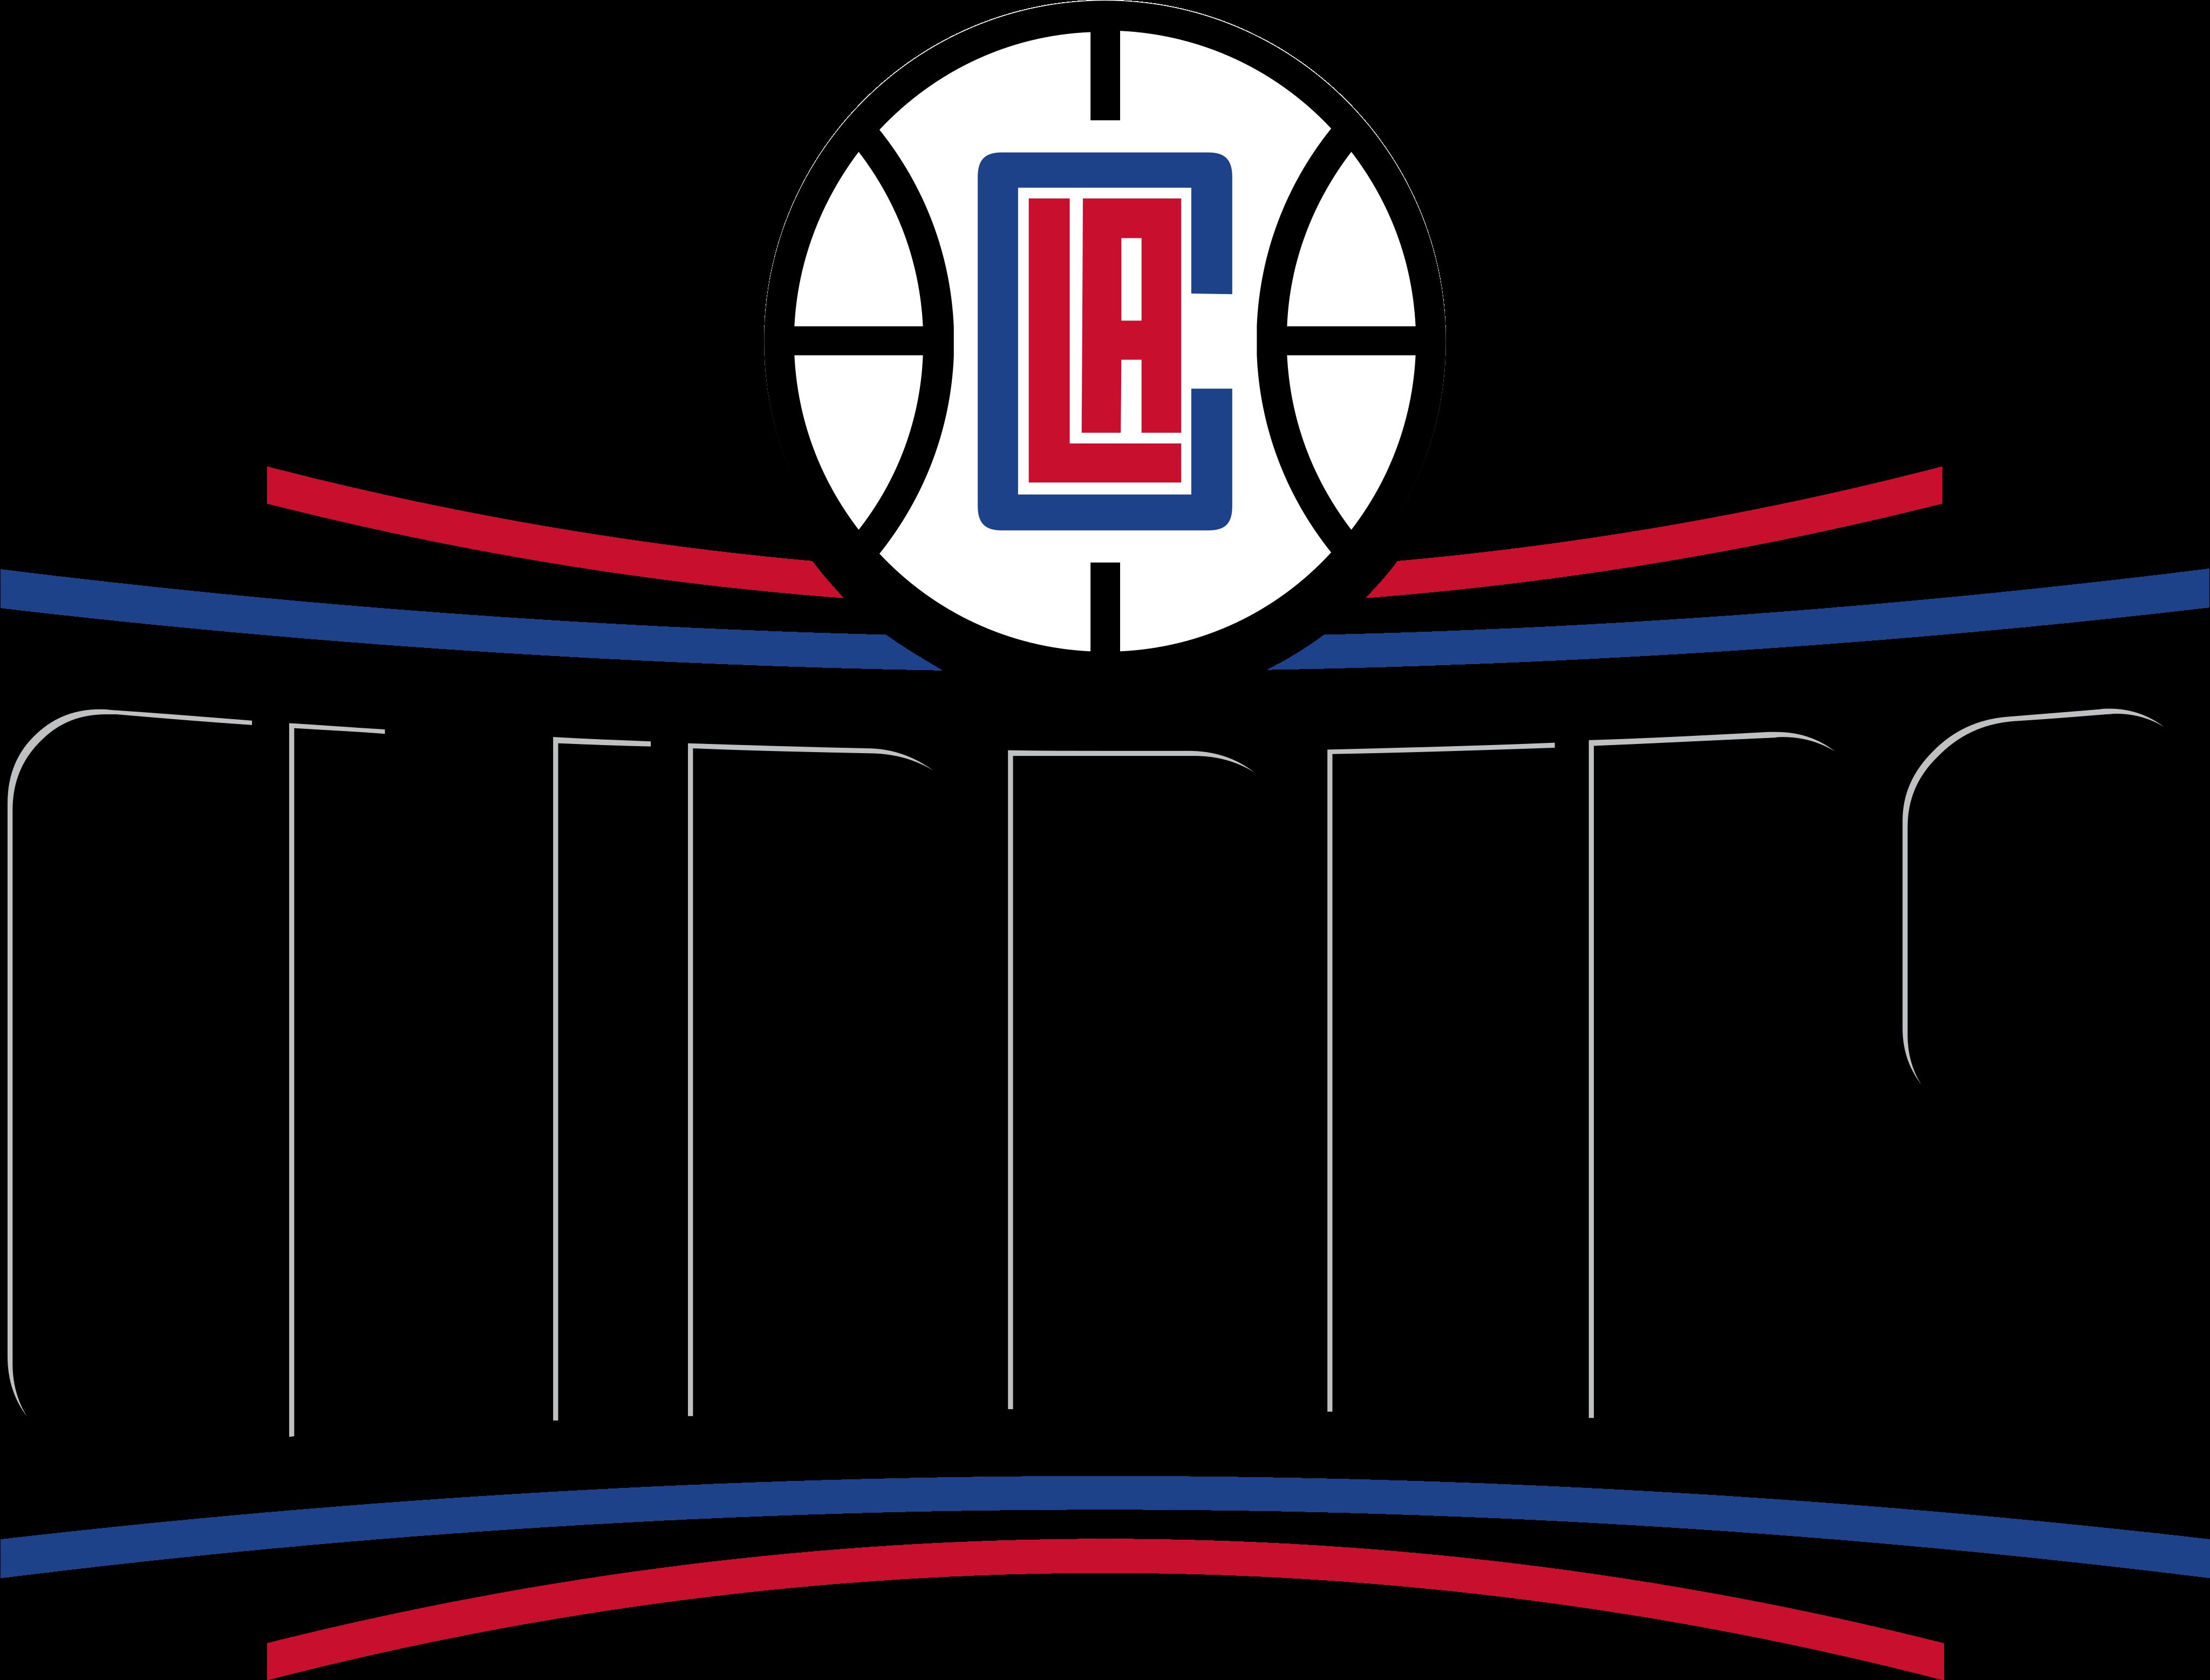 la clippers logo 1 - LA Clippers Logo